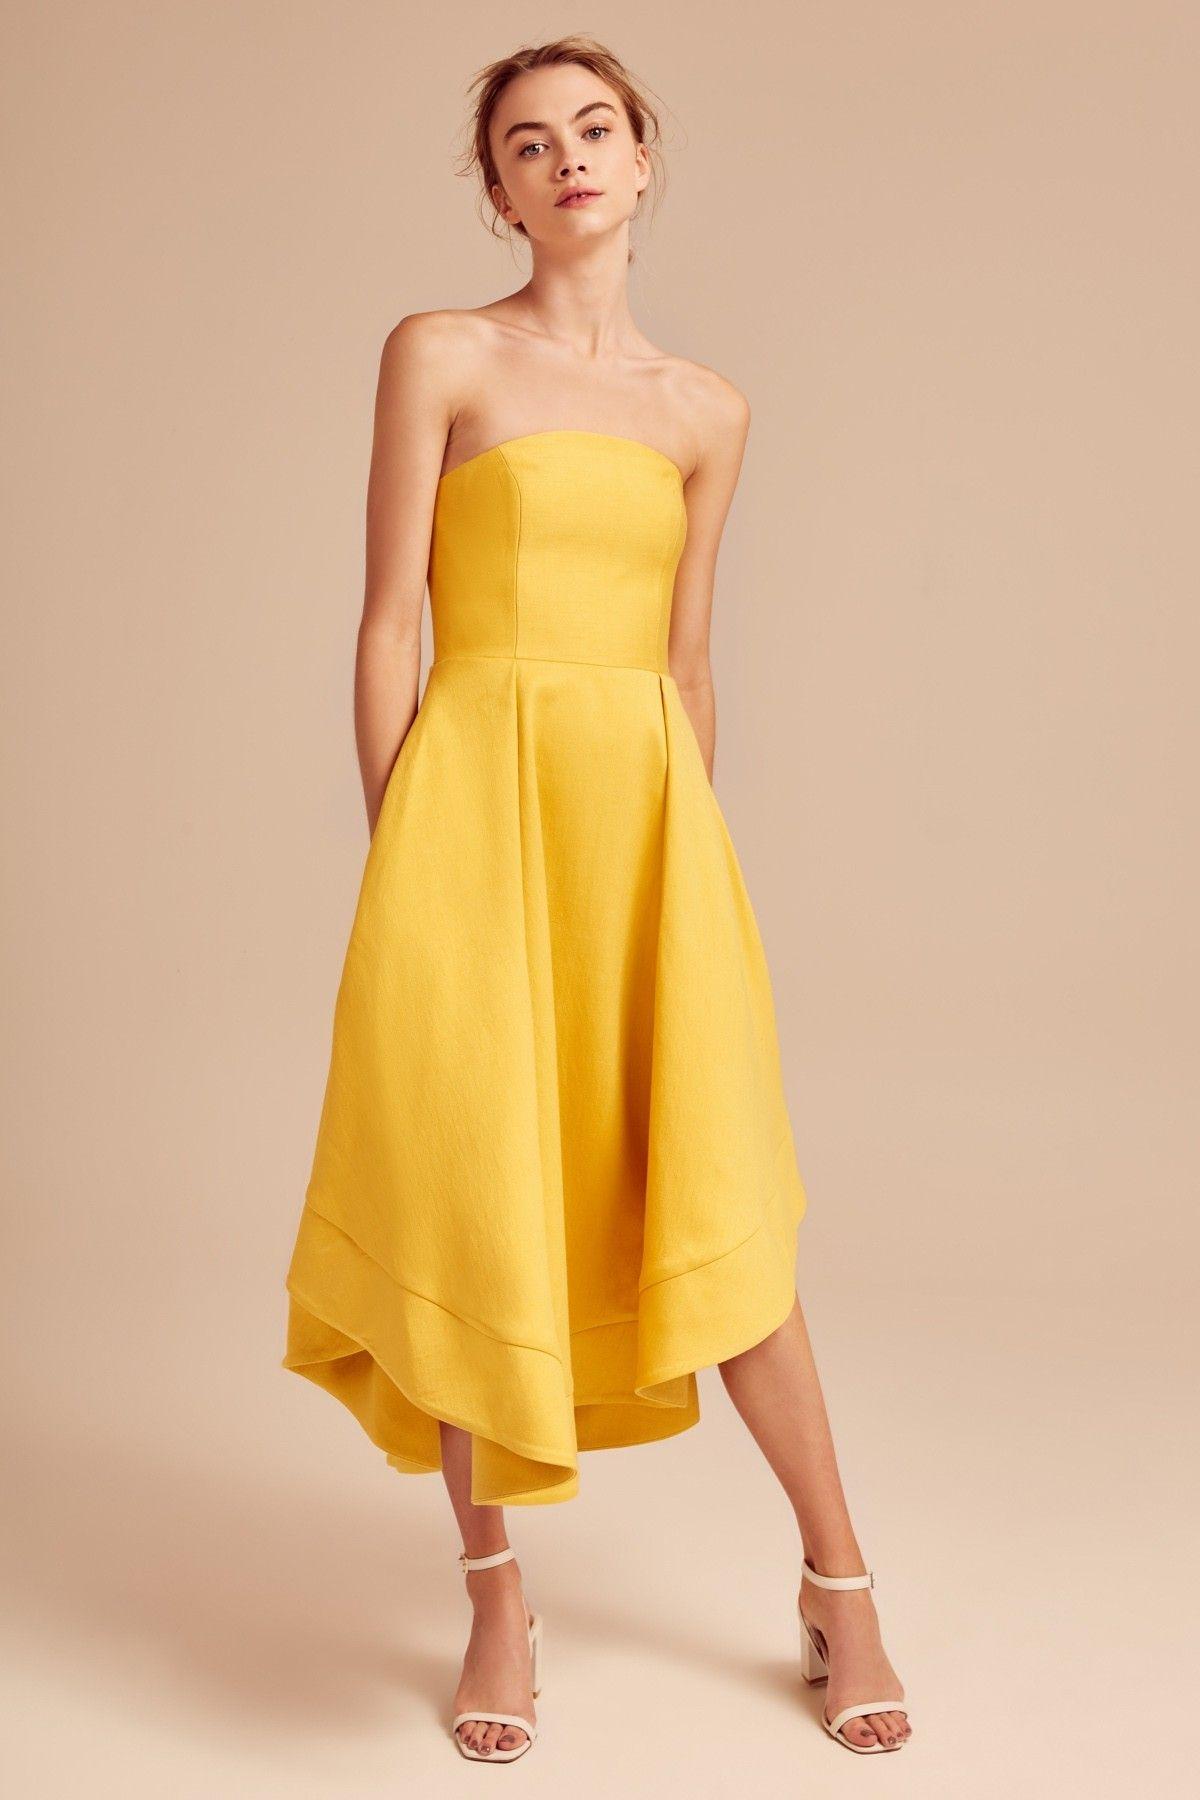 Making Waves Dress Yellow Yellow Strapless Dress Cocktail Dress Yellow Yellow Prom Dress Long [ 1800 x 1200 Pixel ]